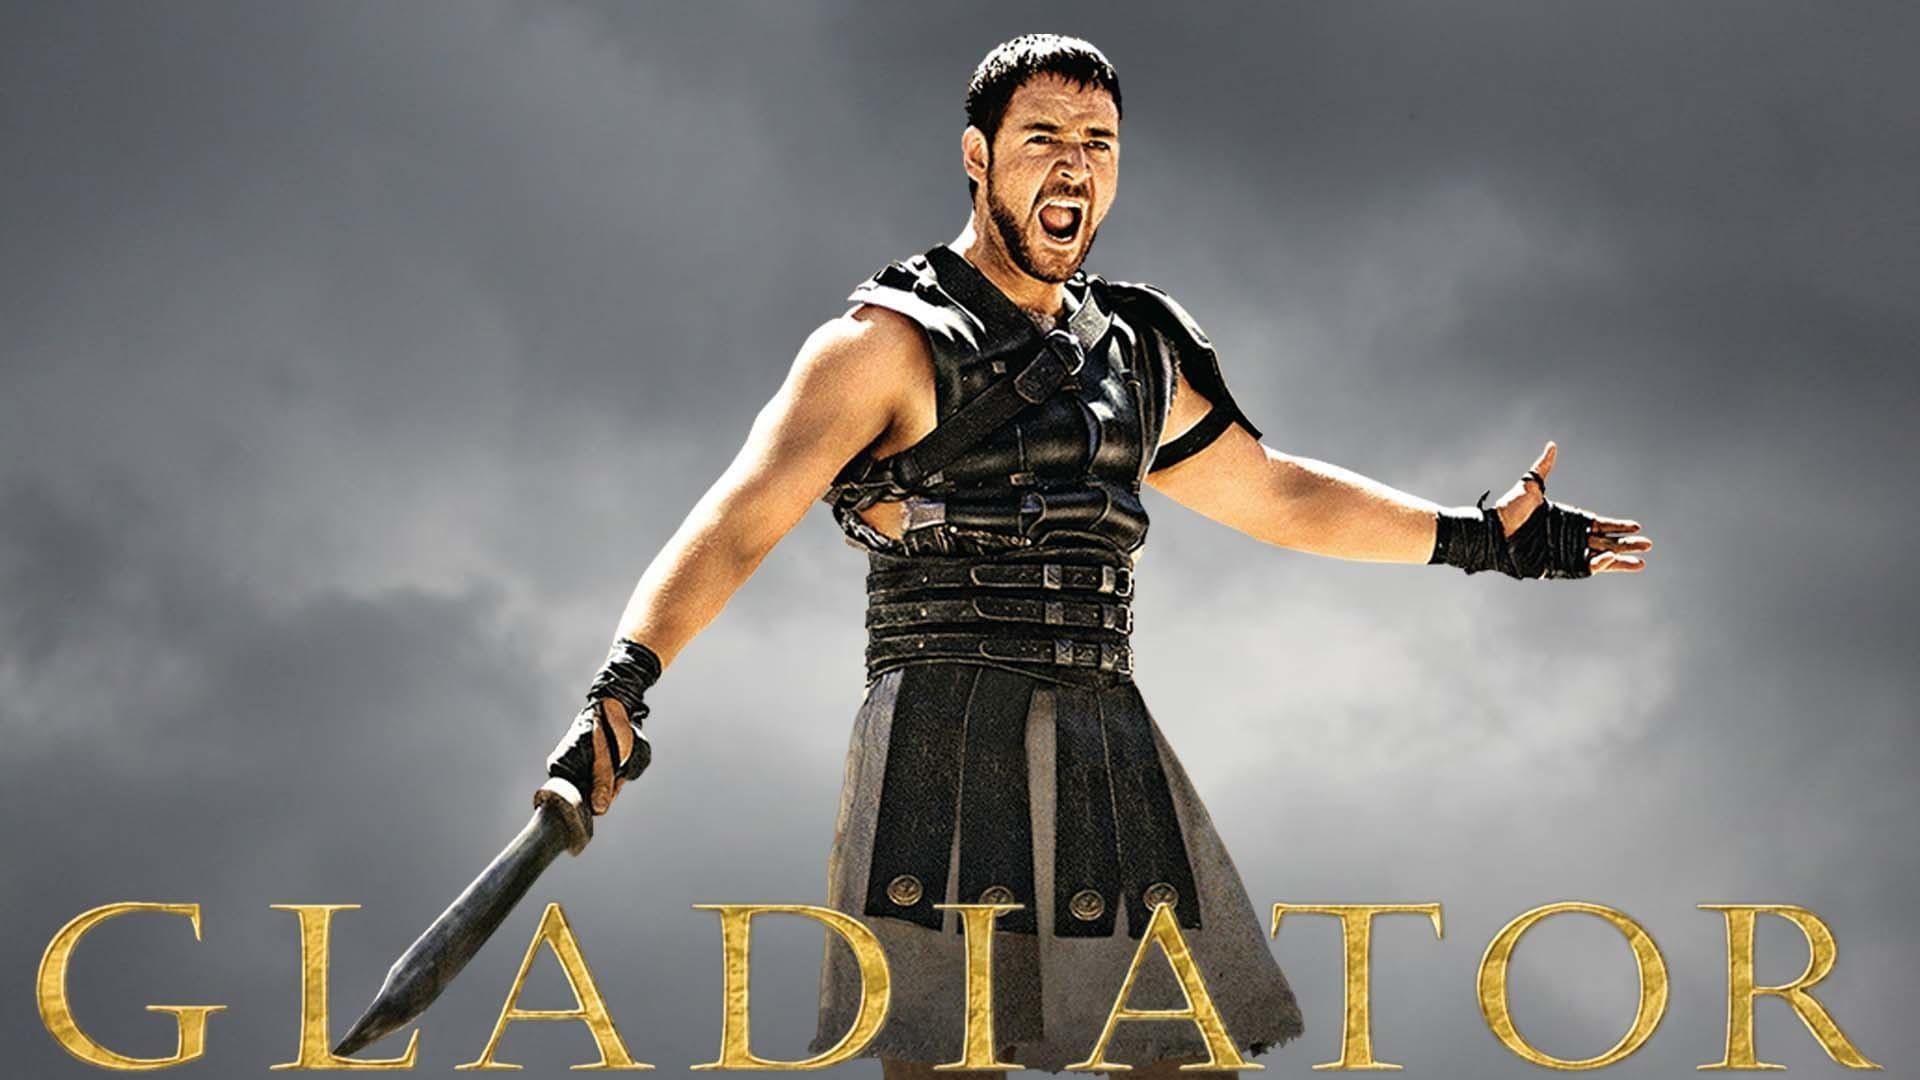 Watch Gladiator El Gladiador 2000 Putlocker Film Complet